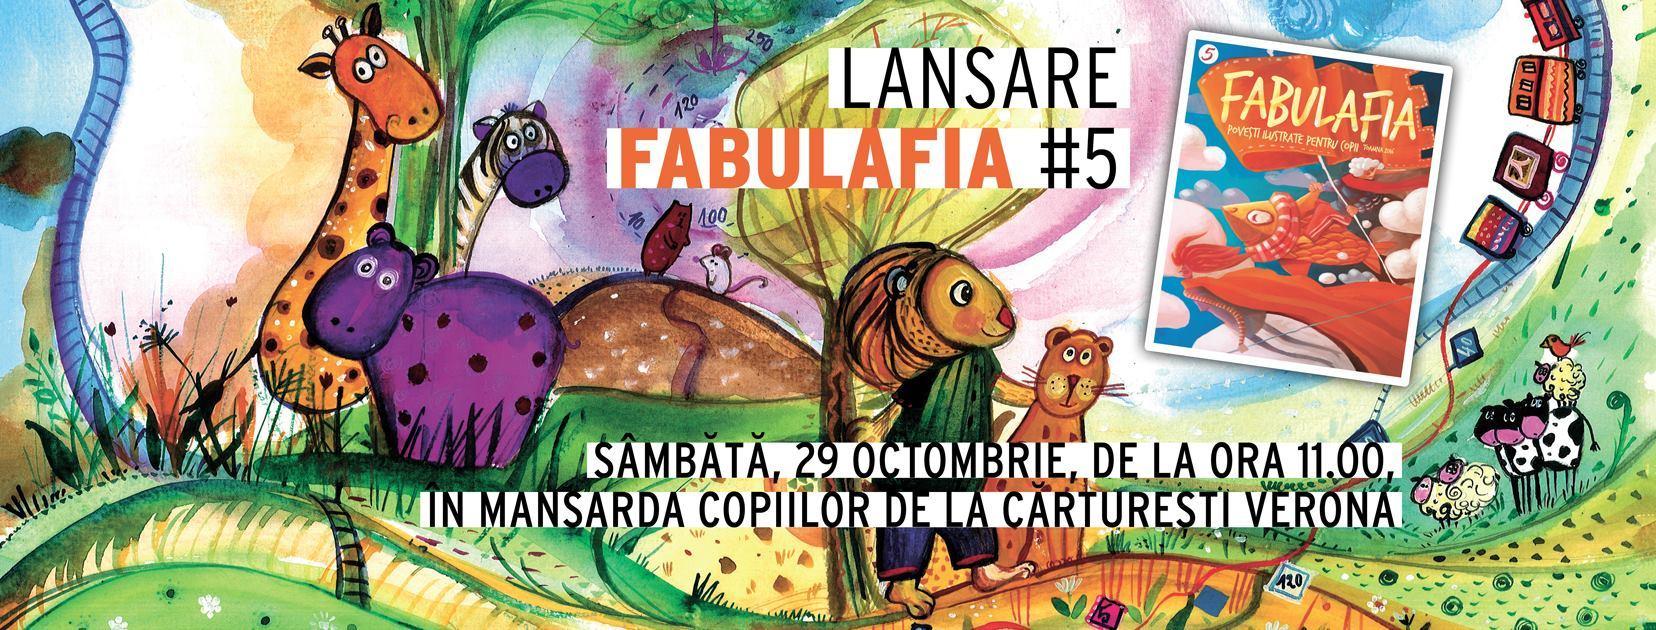 "Lansare ""Fabulafia"" #5"